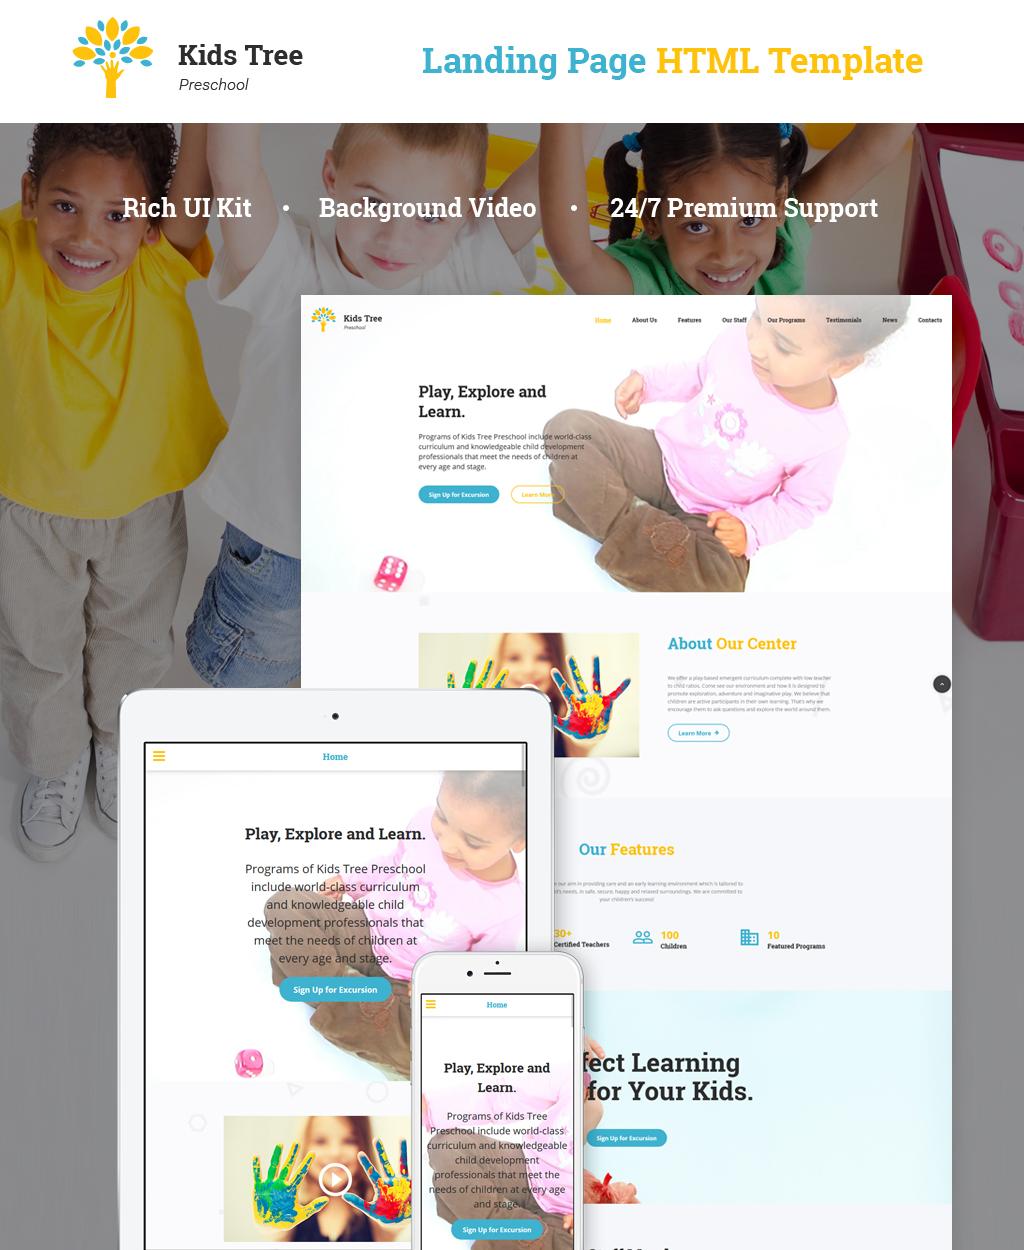 Kids Tree Preschool Landing Page Template